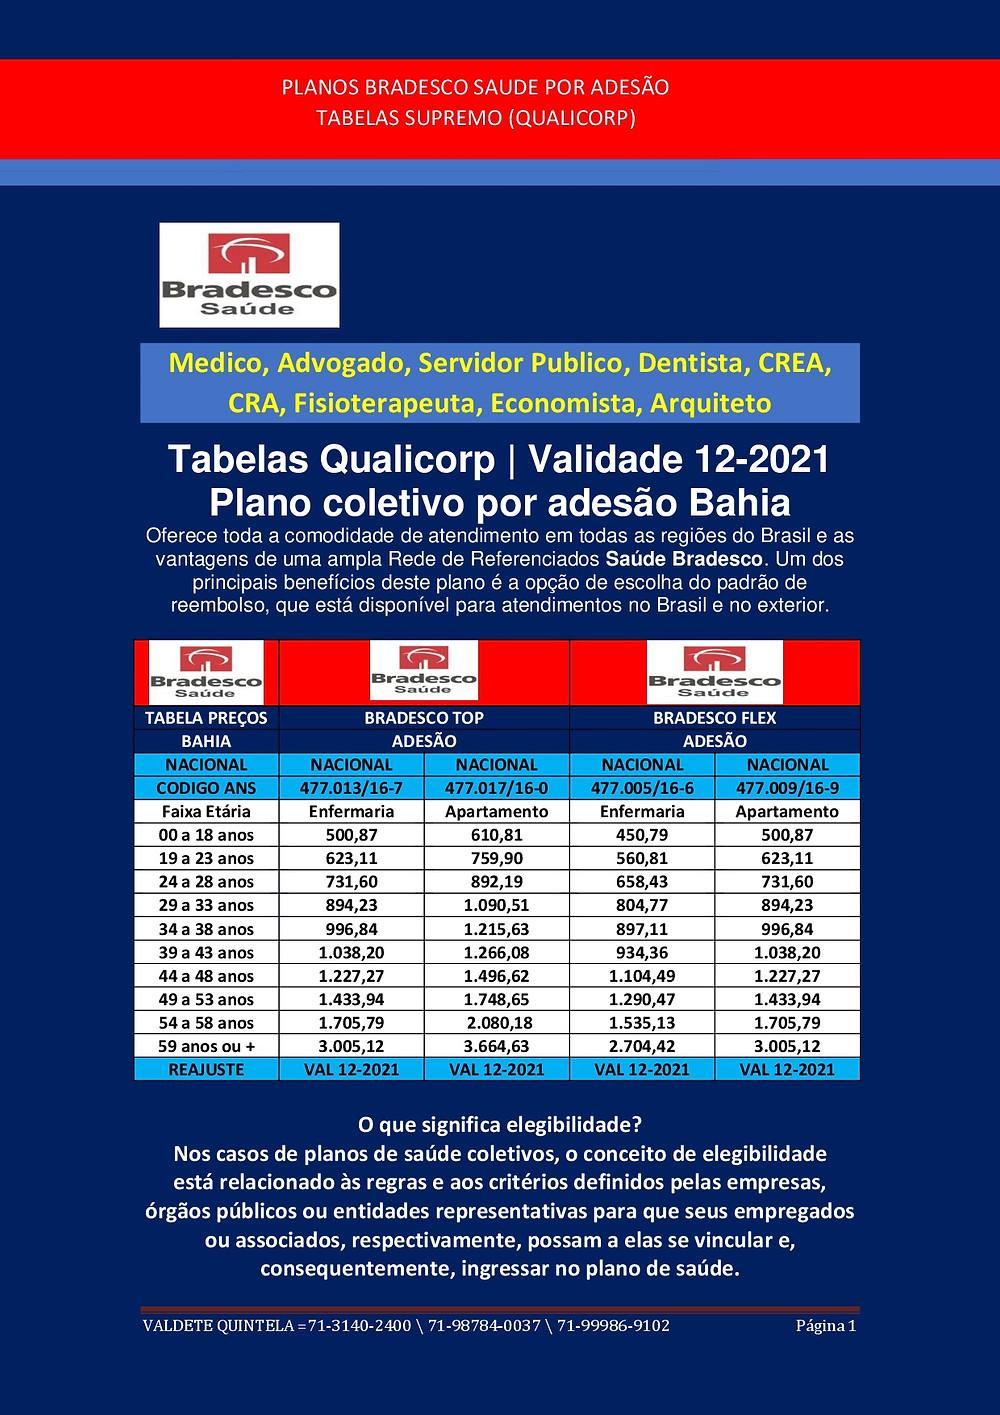 Tabelas 2020/2021   Planos de Saude - BRADESCO SAUDE TABELAS QUALICORP-BA